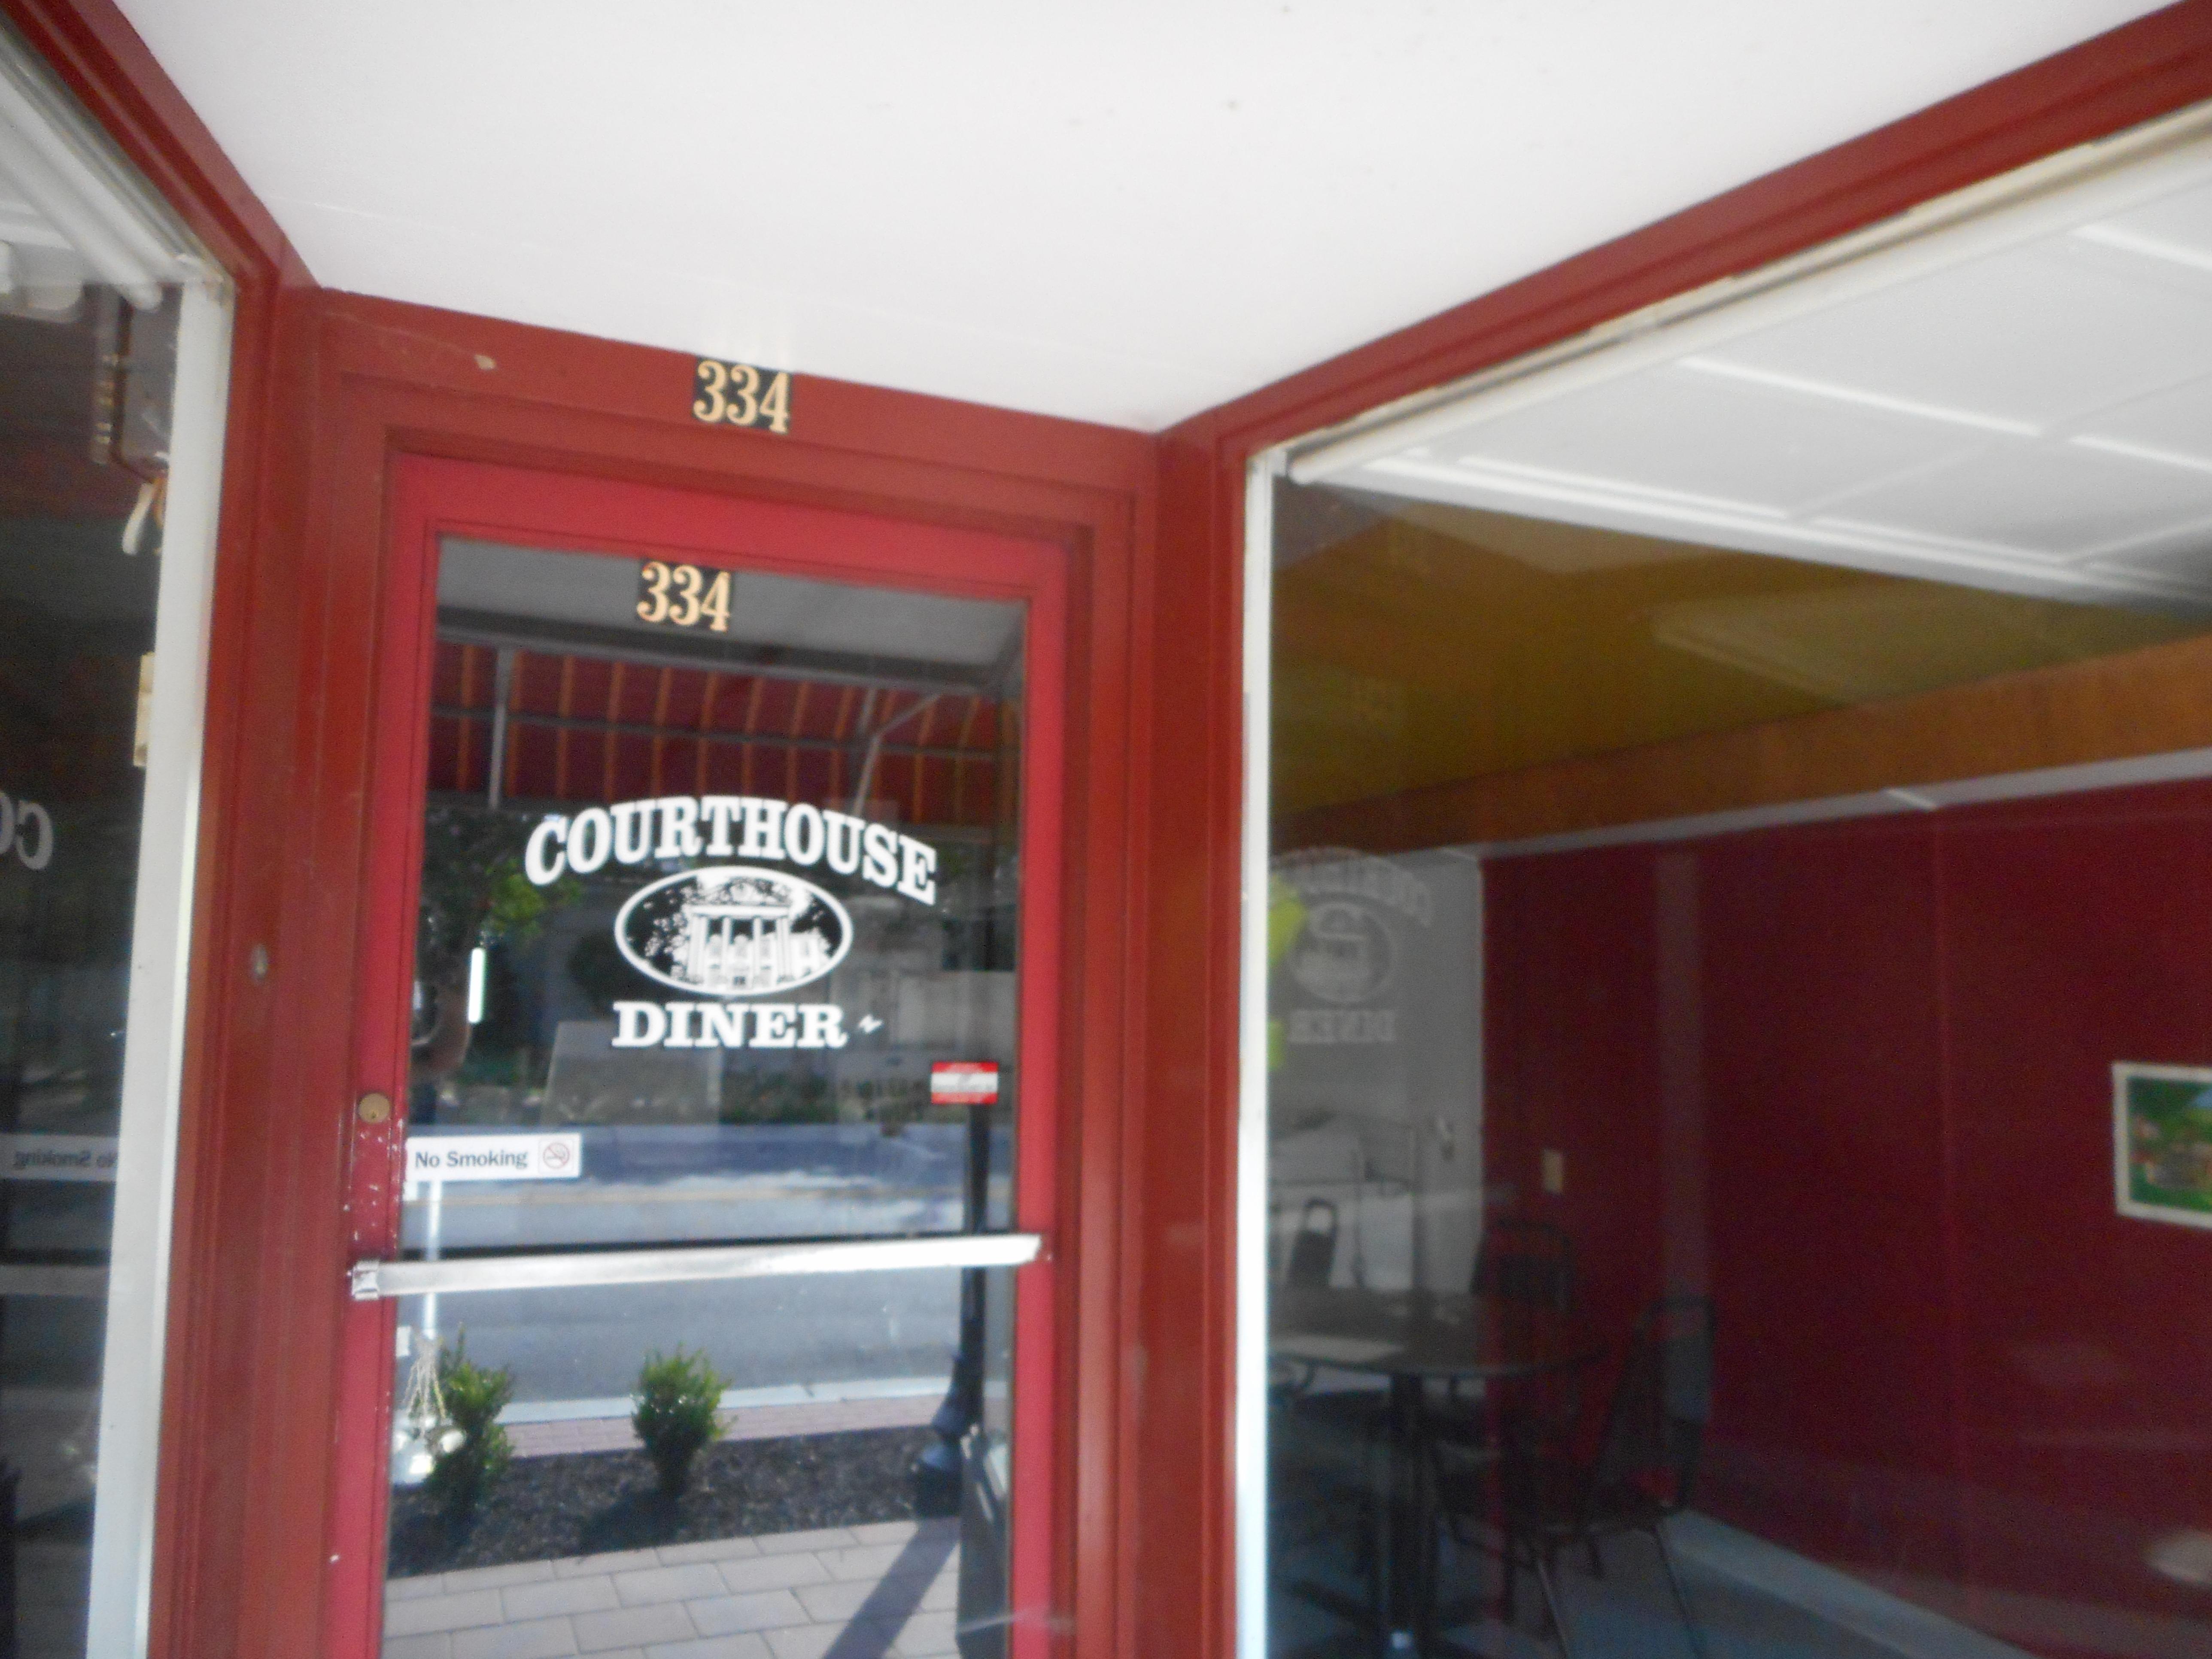 FileEmporia Courthouse Diner Door.jpg & File:Emporia Courthouse Diner Door.jpg - Wikimedia Commons